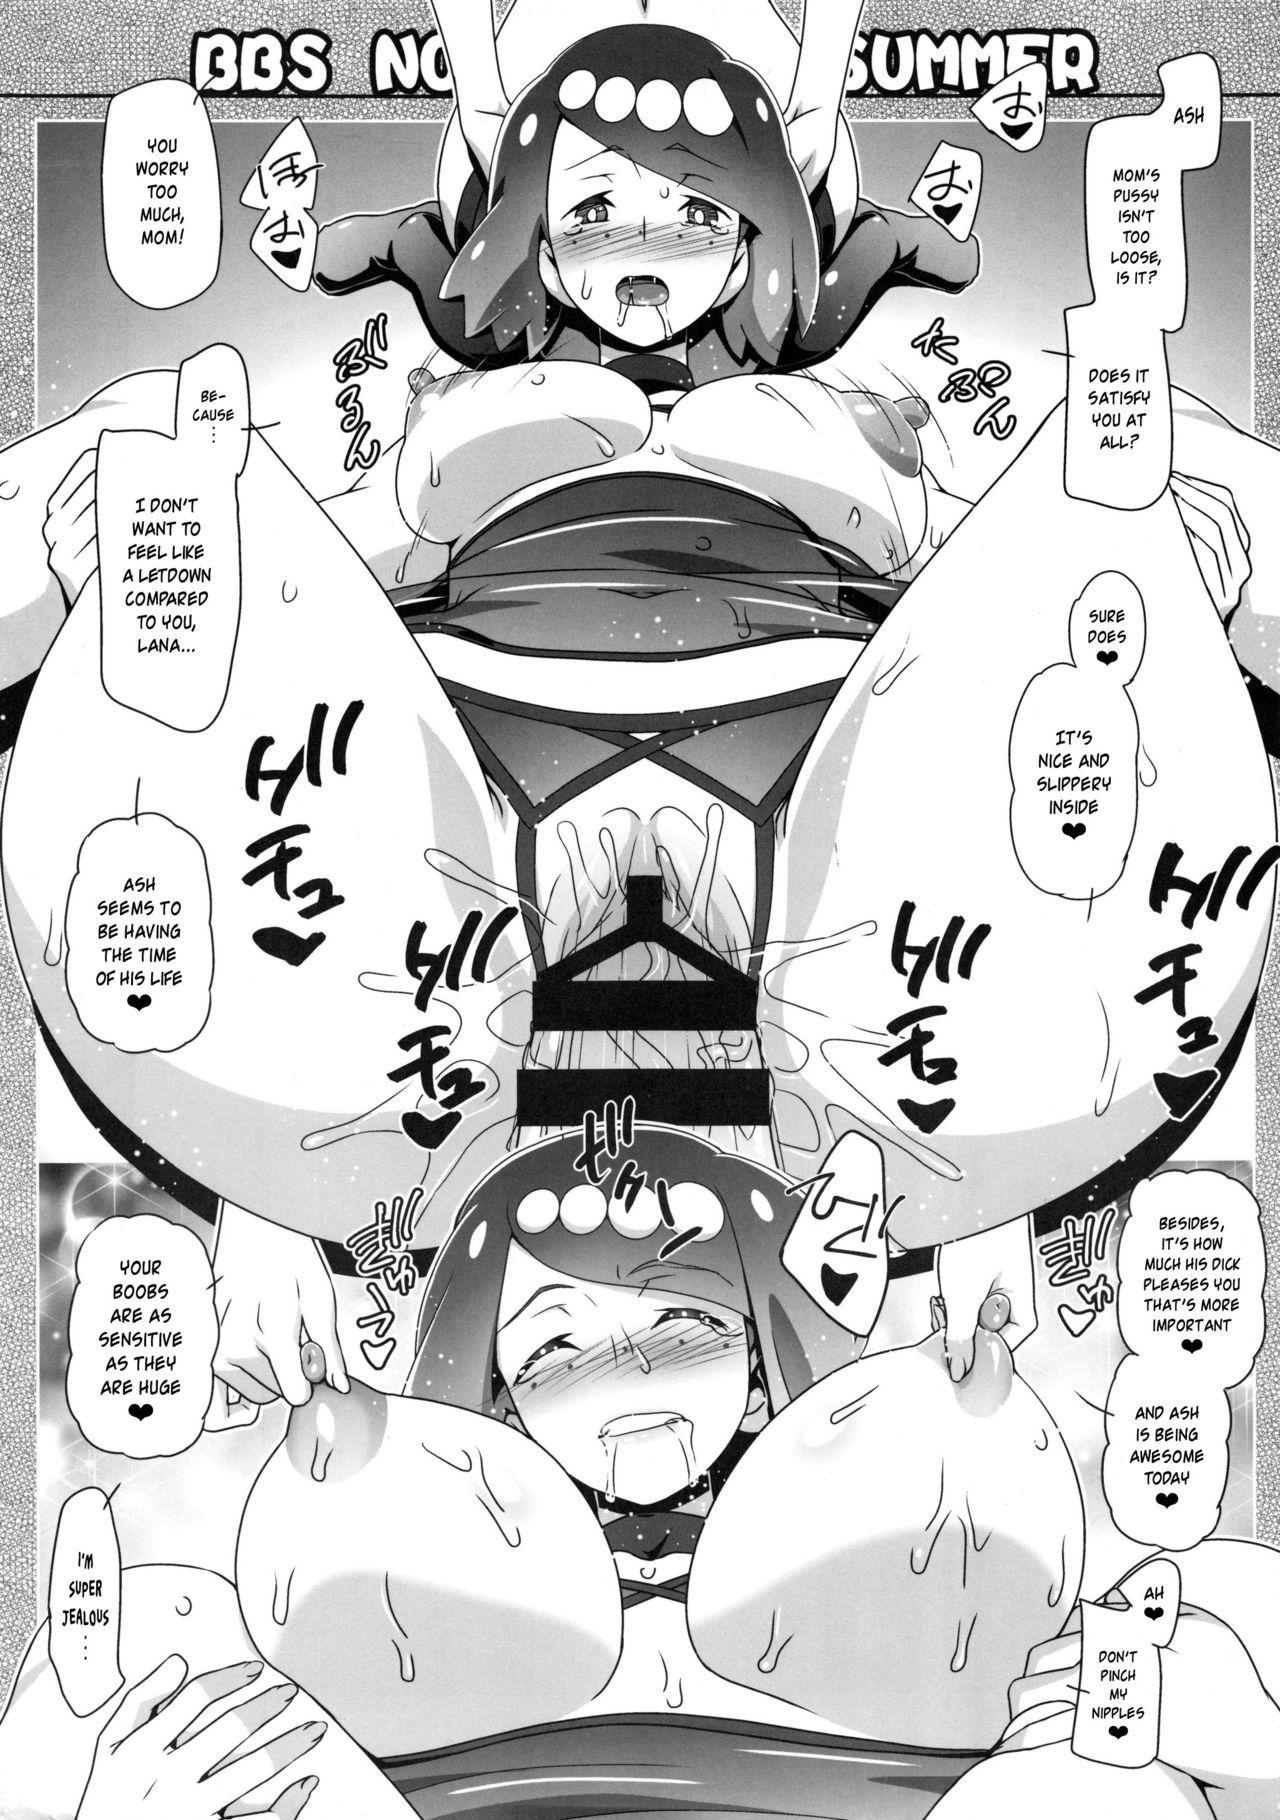 (C96) [Gambler Club (Kousaka Jun)] BBS NOTE 2019 SUMMER Siren-sanchi no Oyakodon   Three-Way at Lana's House (Pokémon Sun and Moon) [English] {risette translations} 2